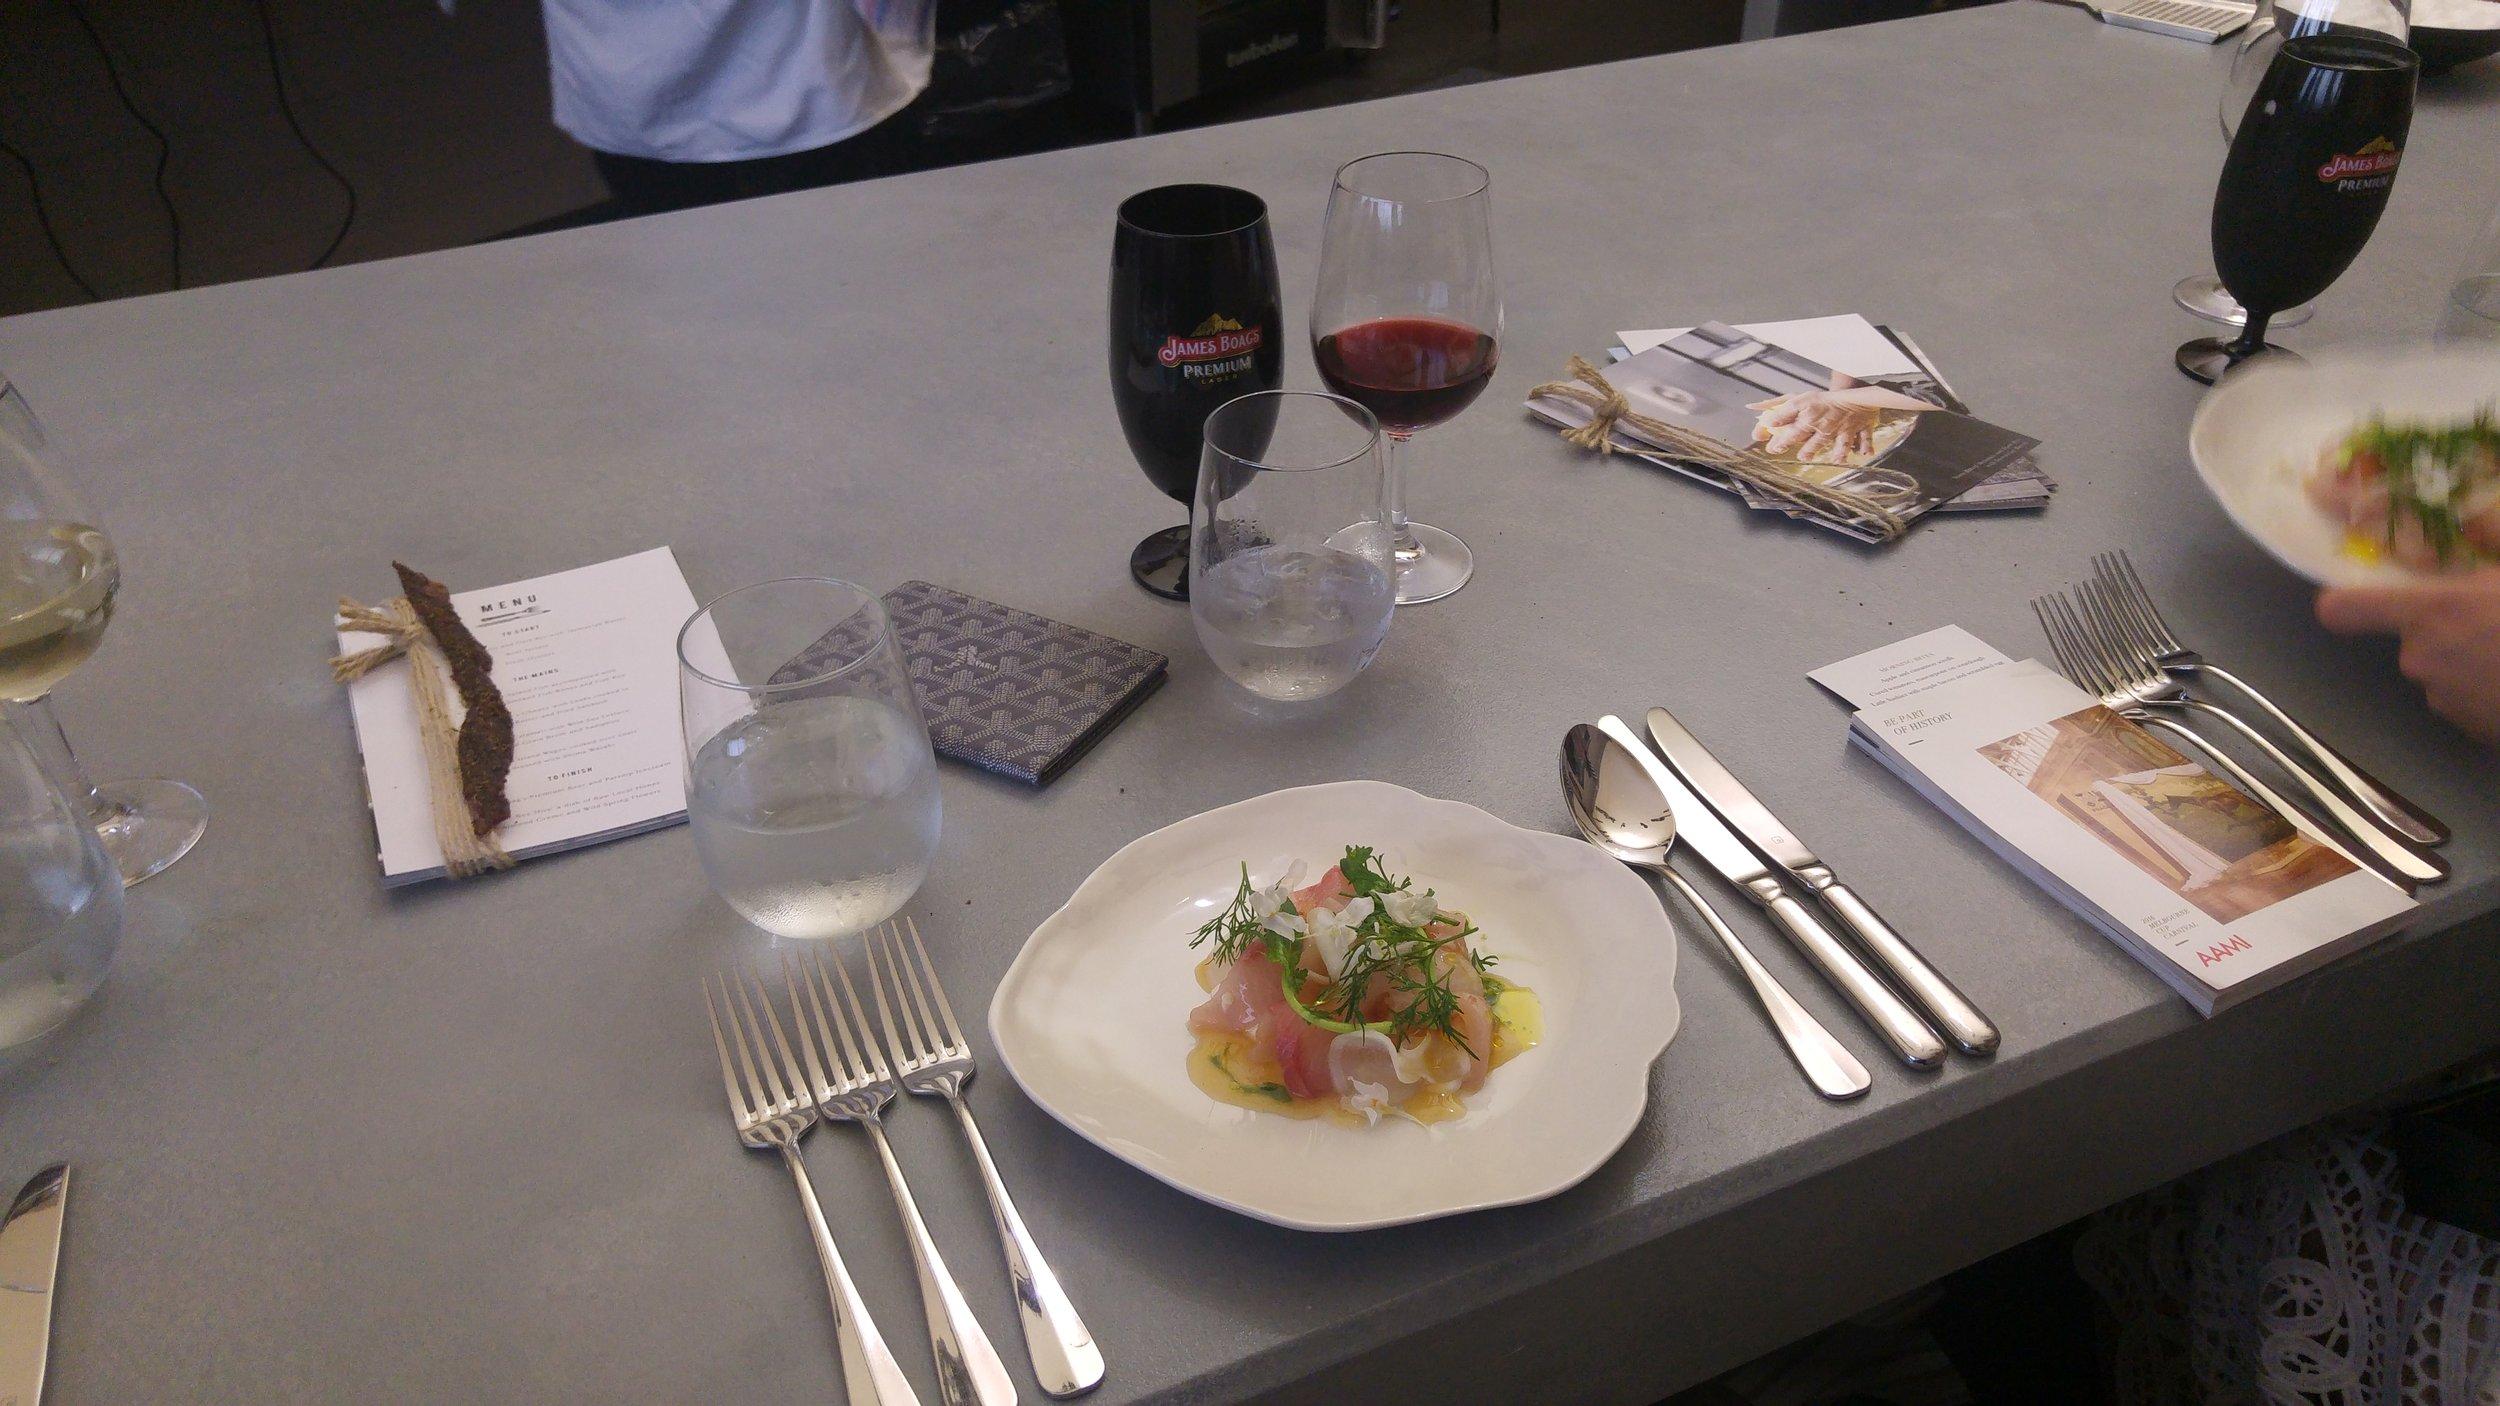 James Boag Beer Harnessed Melbourne Cup Mr Gumbatron Derby Day VRC Foodie Melbourne  Fine Dining Biota Dining Room